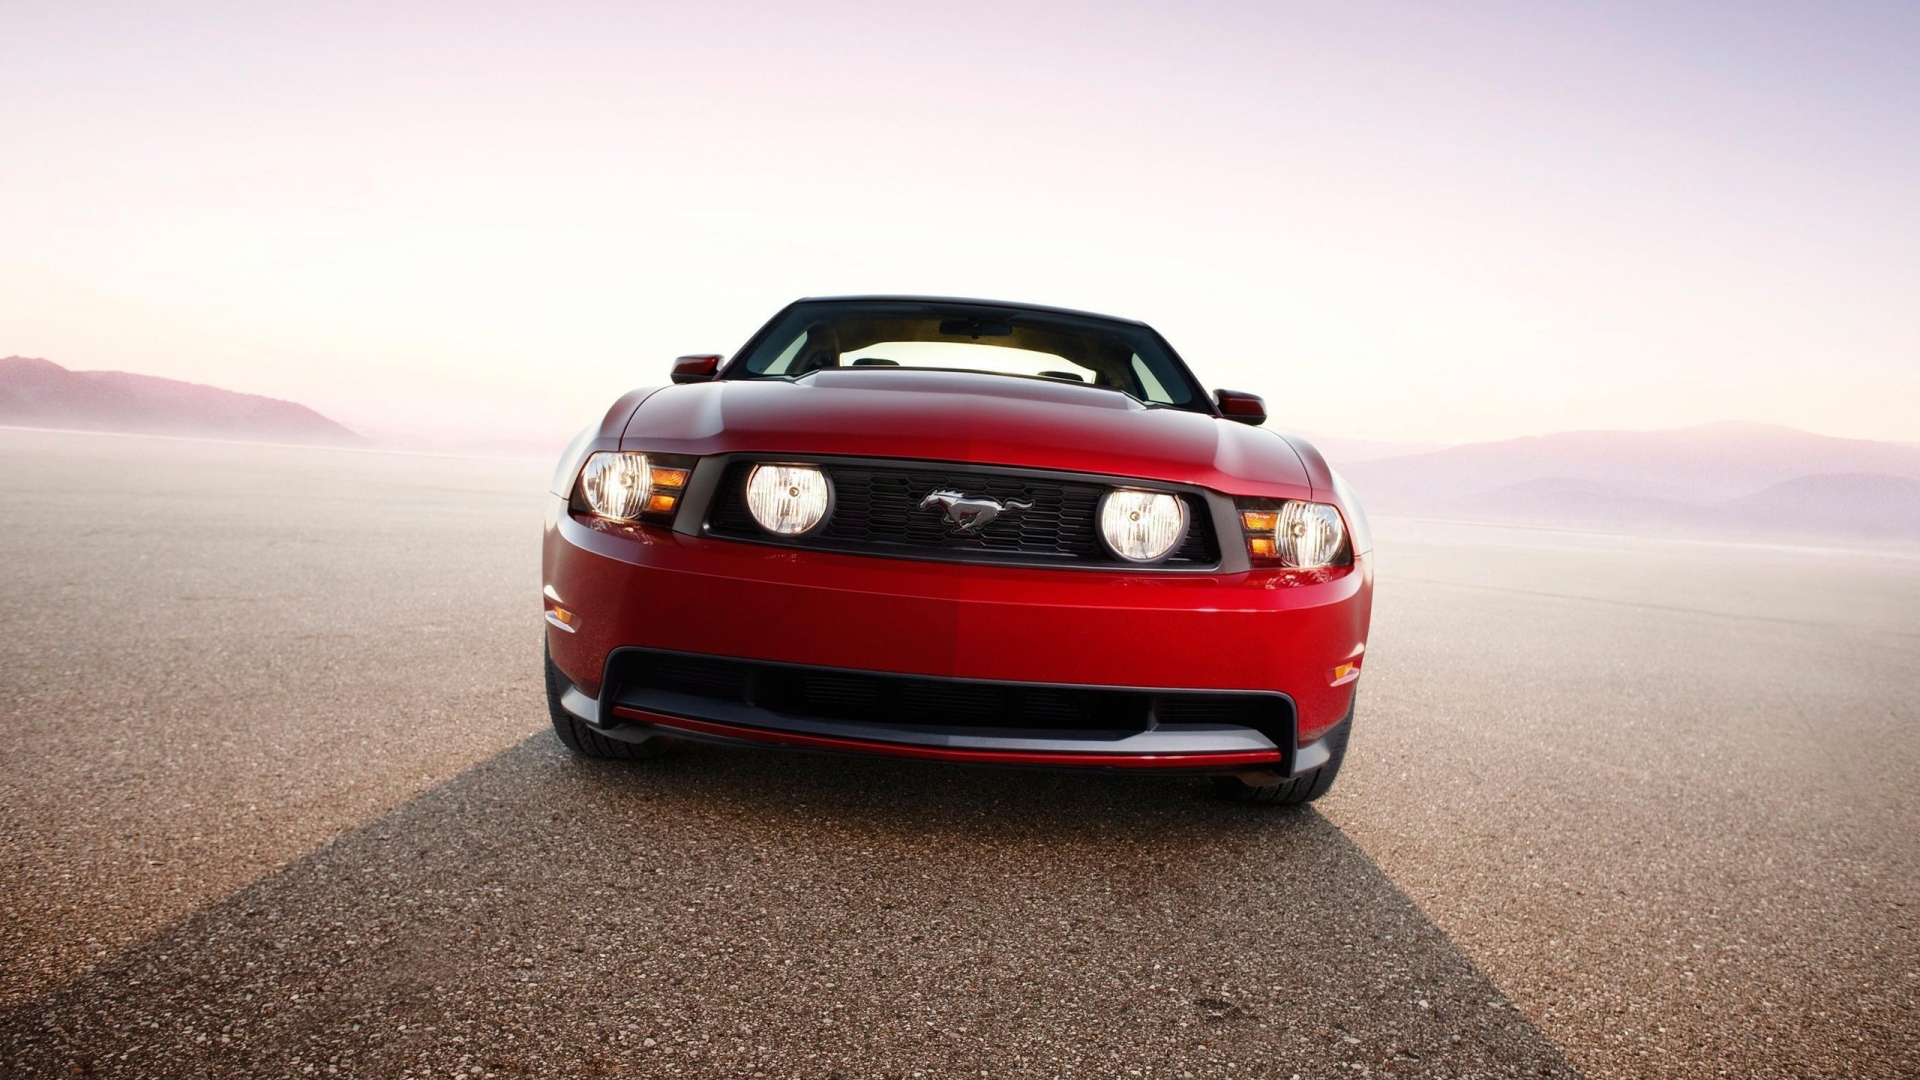 Ford Mustang GT hd 1920x1080   imagenes   wallpapers gratis 1920x1080